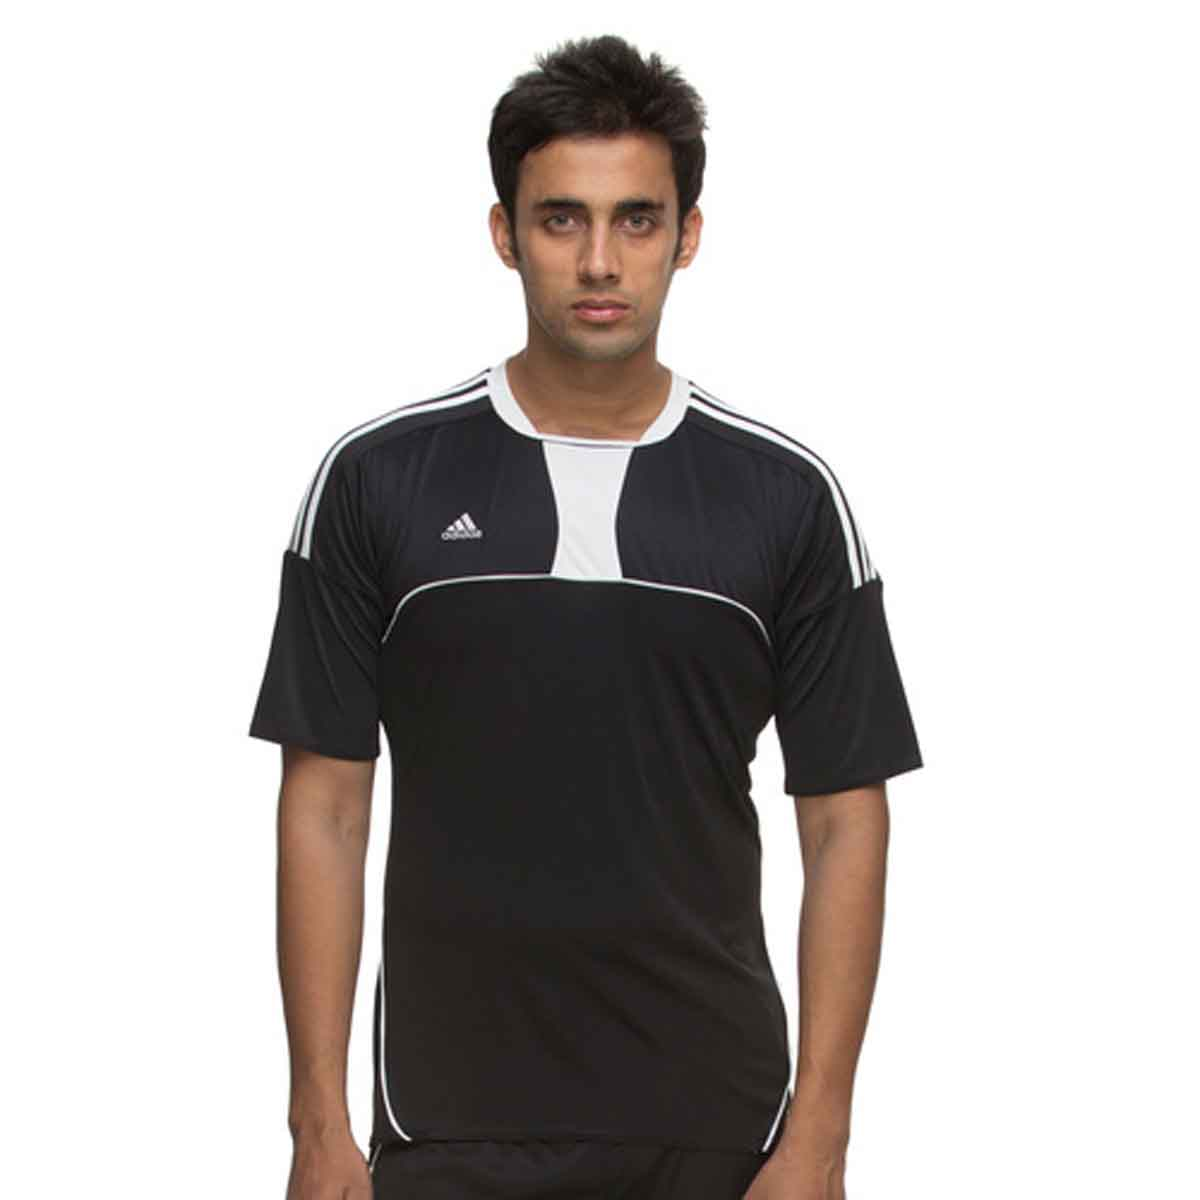 778e1106bd85 Buy Adidas Men's Football Pepa Jersey (Black) Online in India